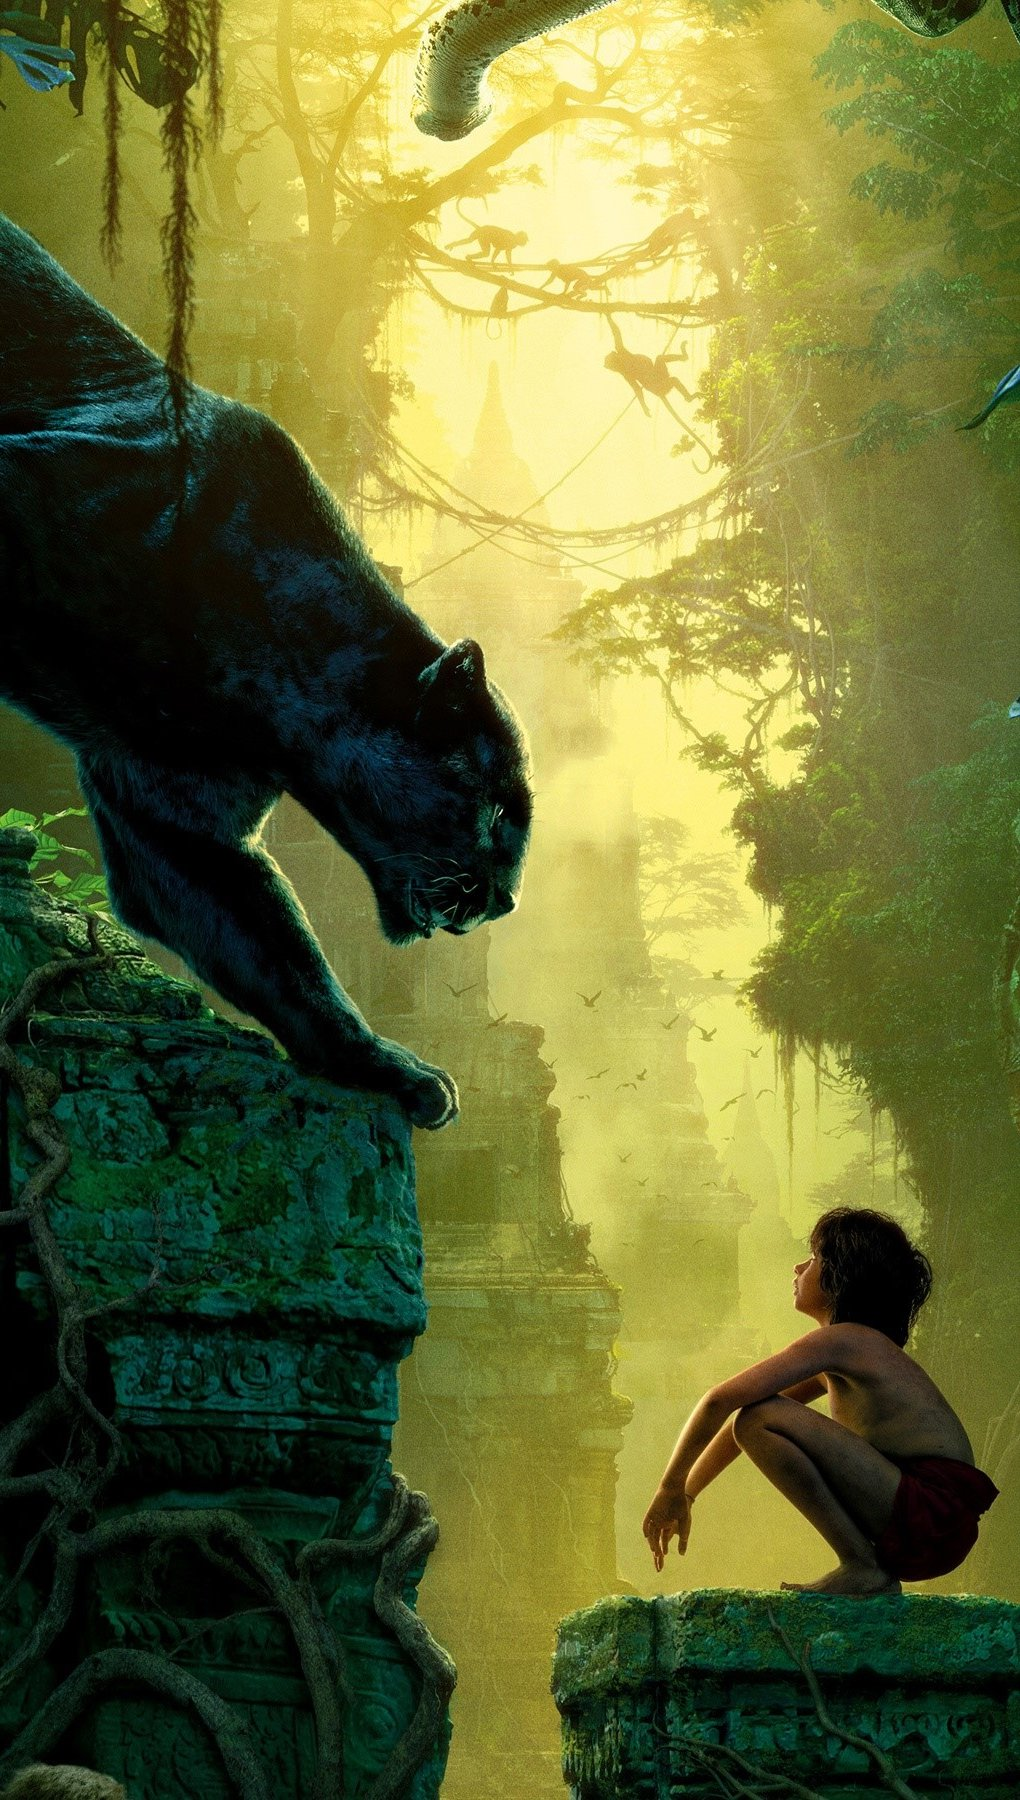 Wallpaper Movie The Jungle Book 2016 Vertical